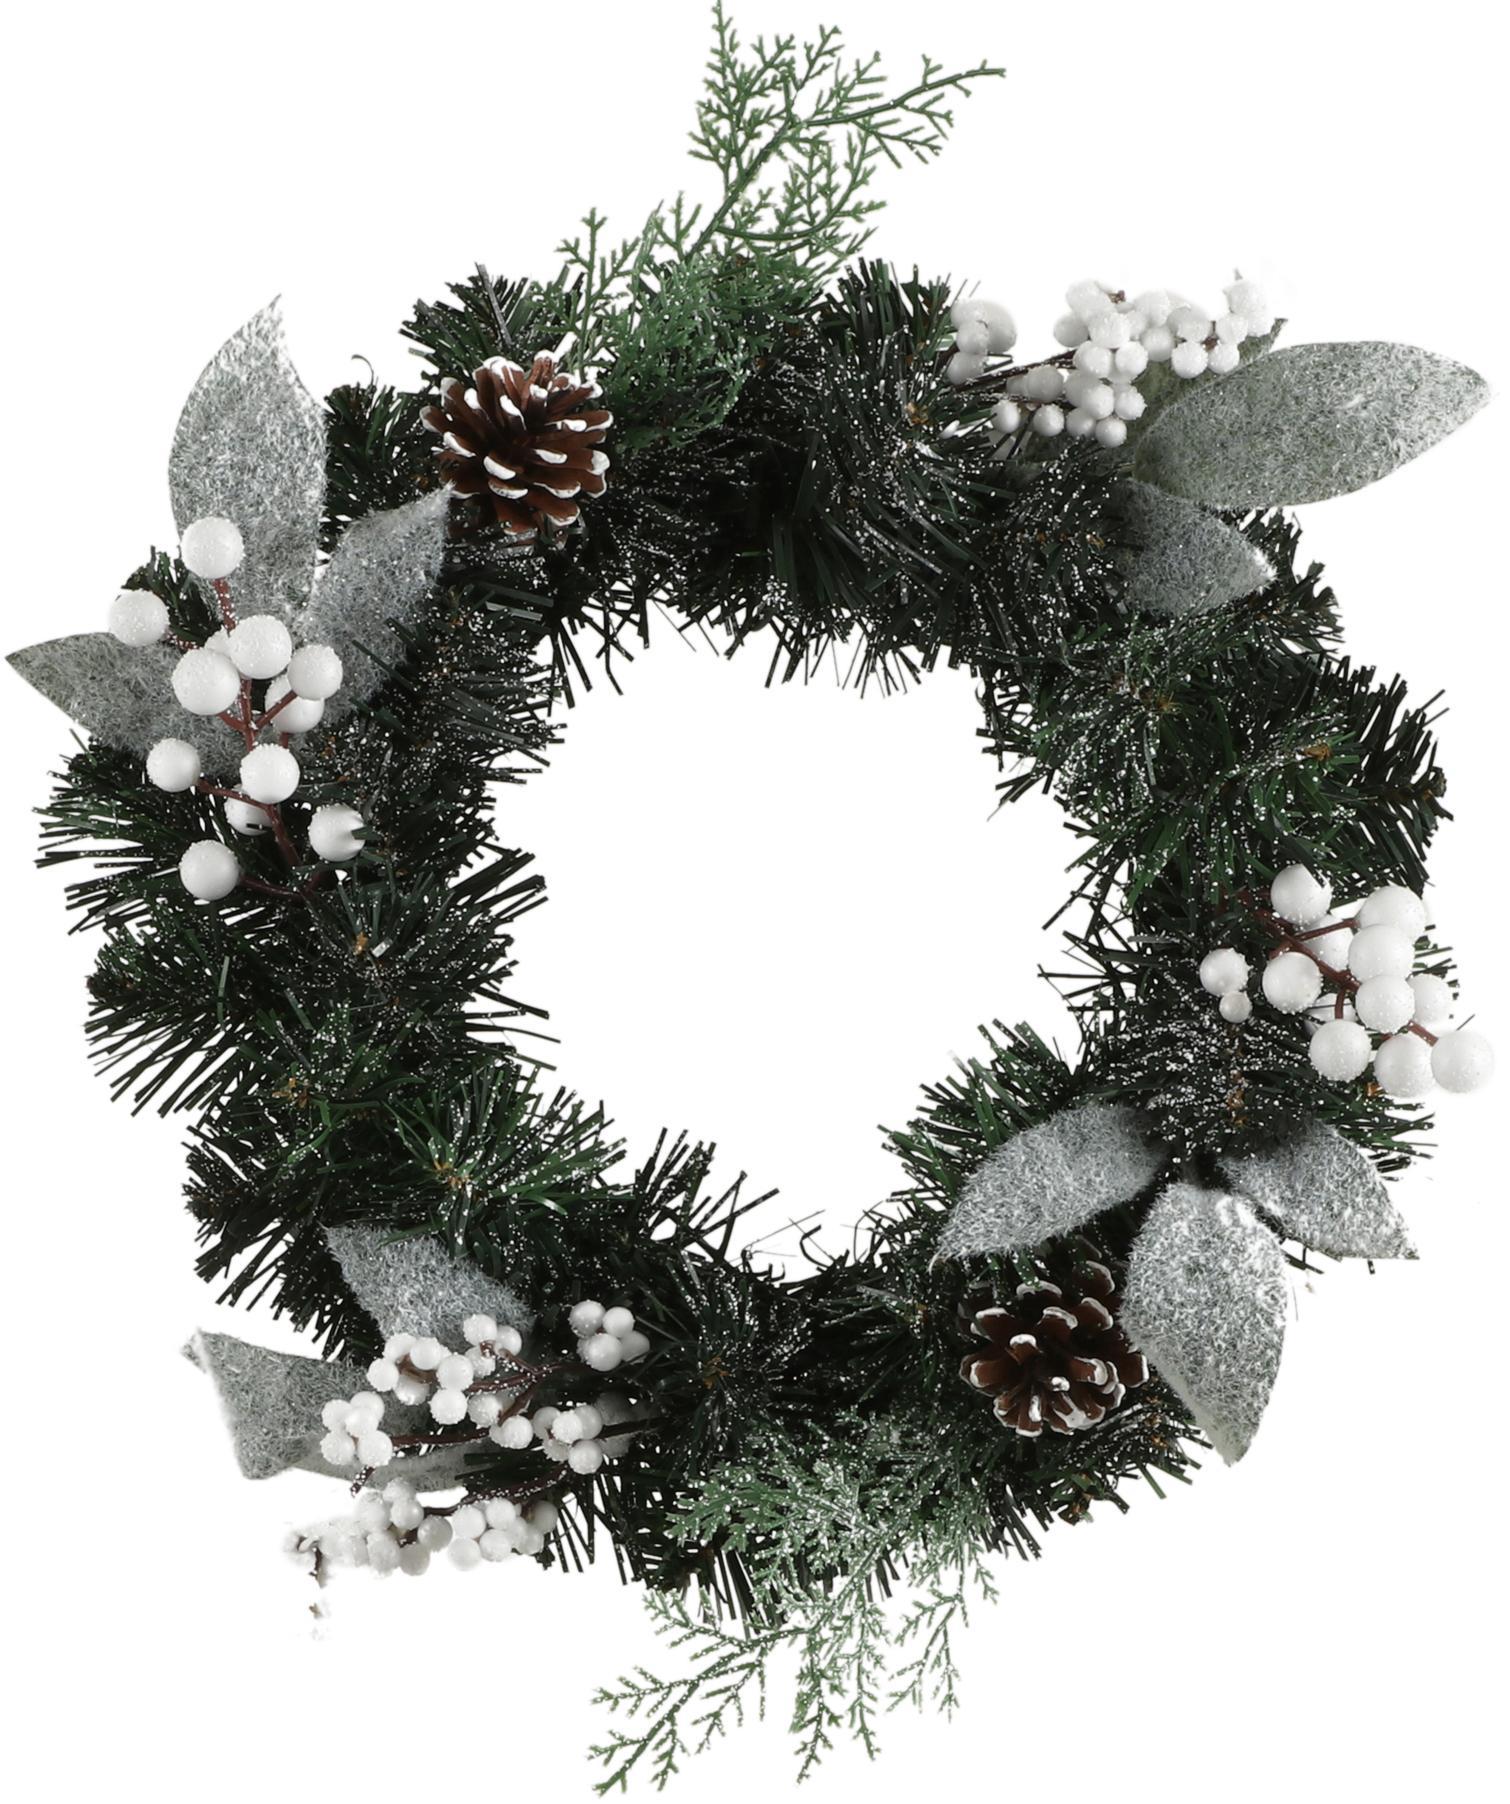 Corona navideña Hailey, Plástico, Verde, blanco, plateado, Ø 30 cm